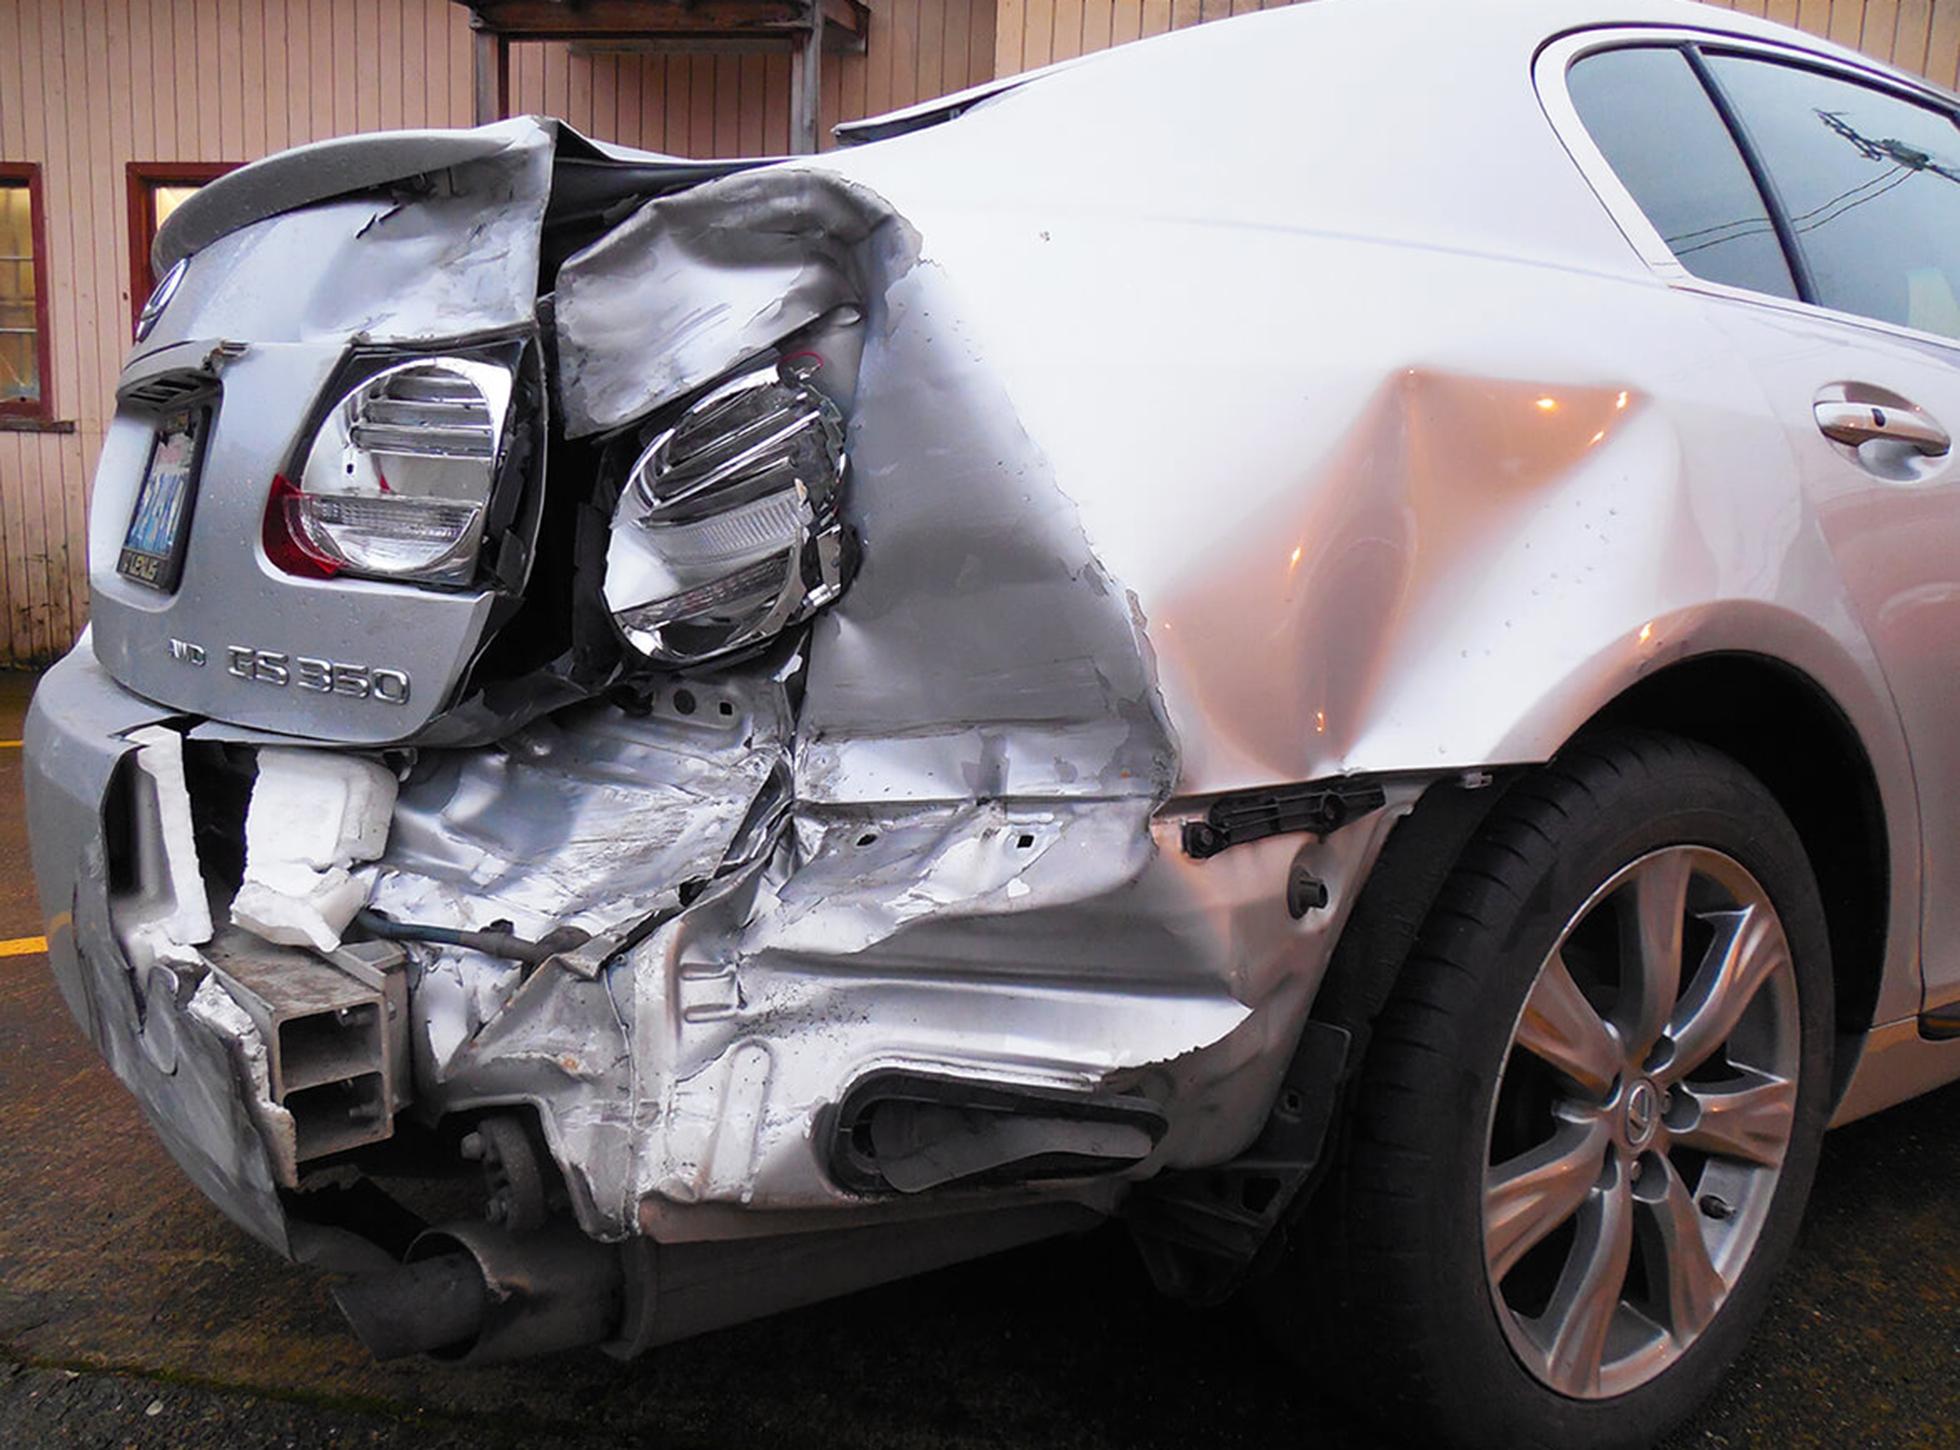 Auto-Buff-Auto-Body-West-Seattle-collision-repair-before-01.JPG